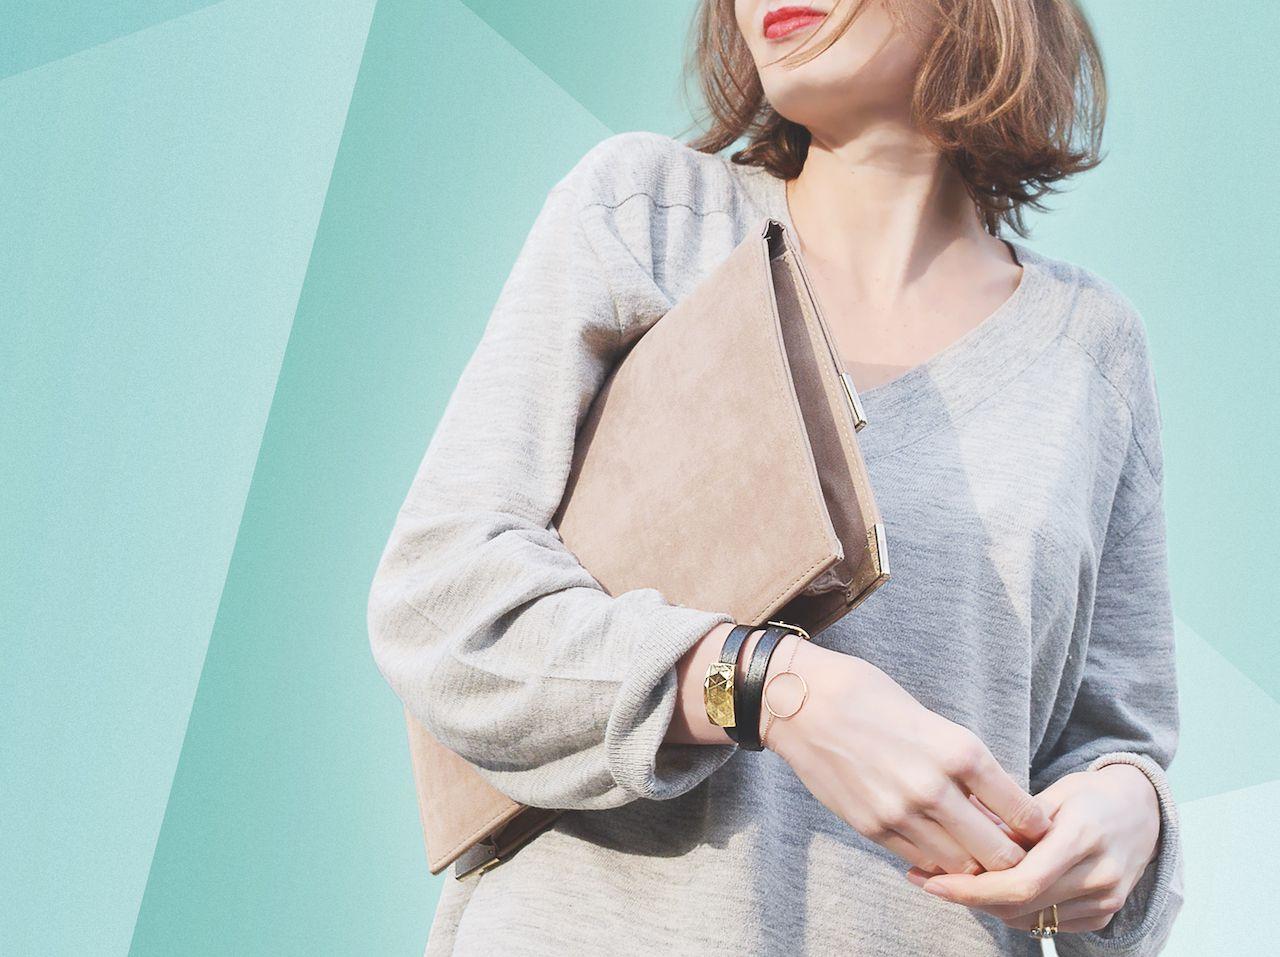 june-by-netatmo-bracelet-connecte